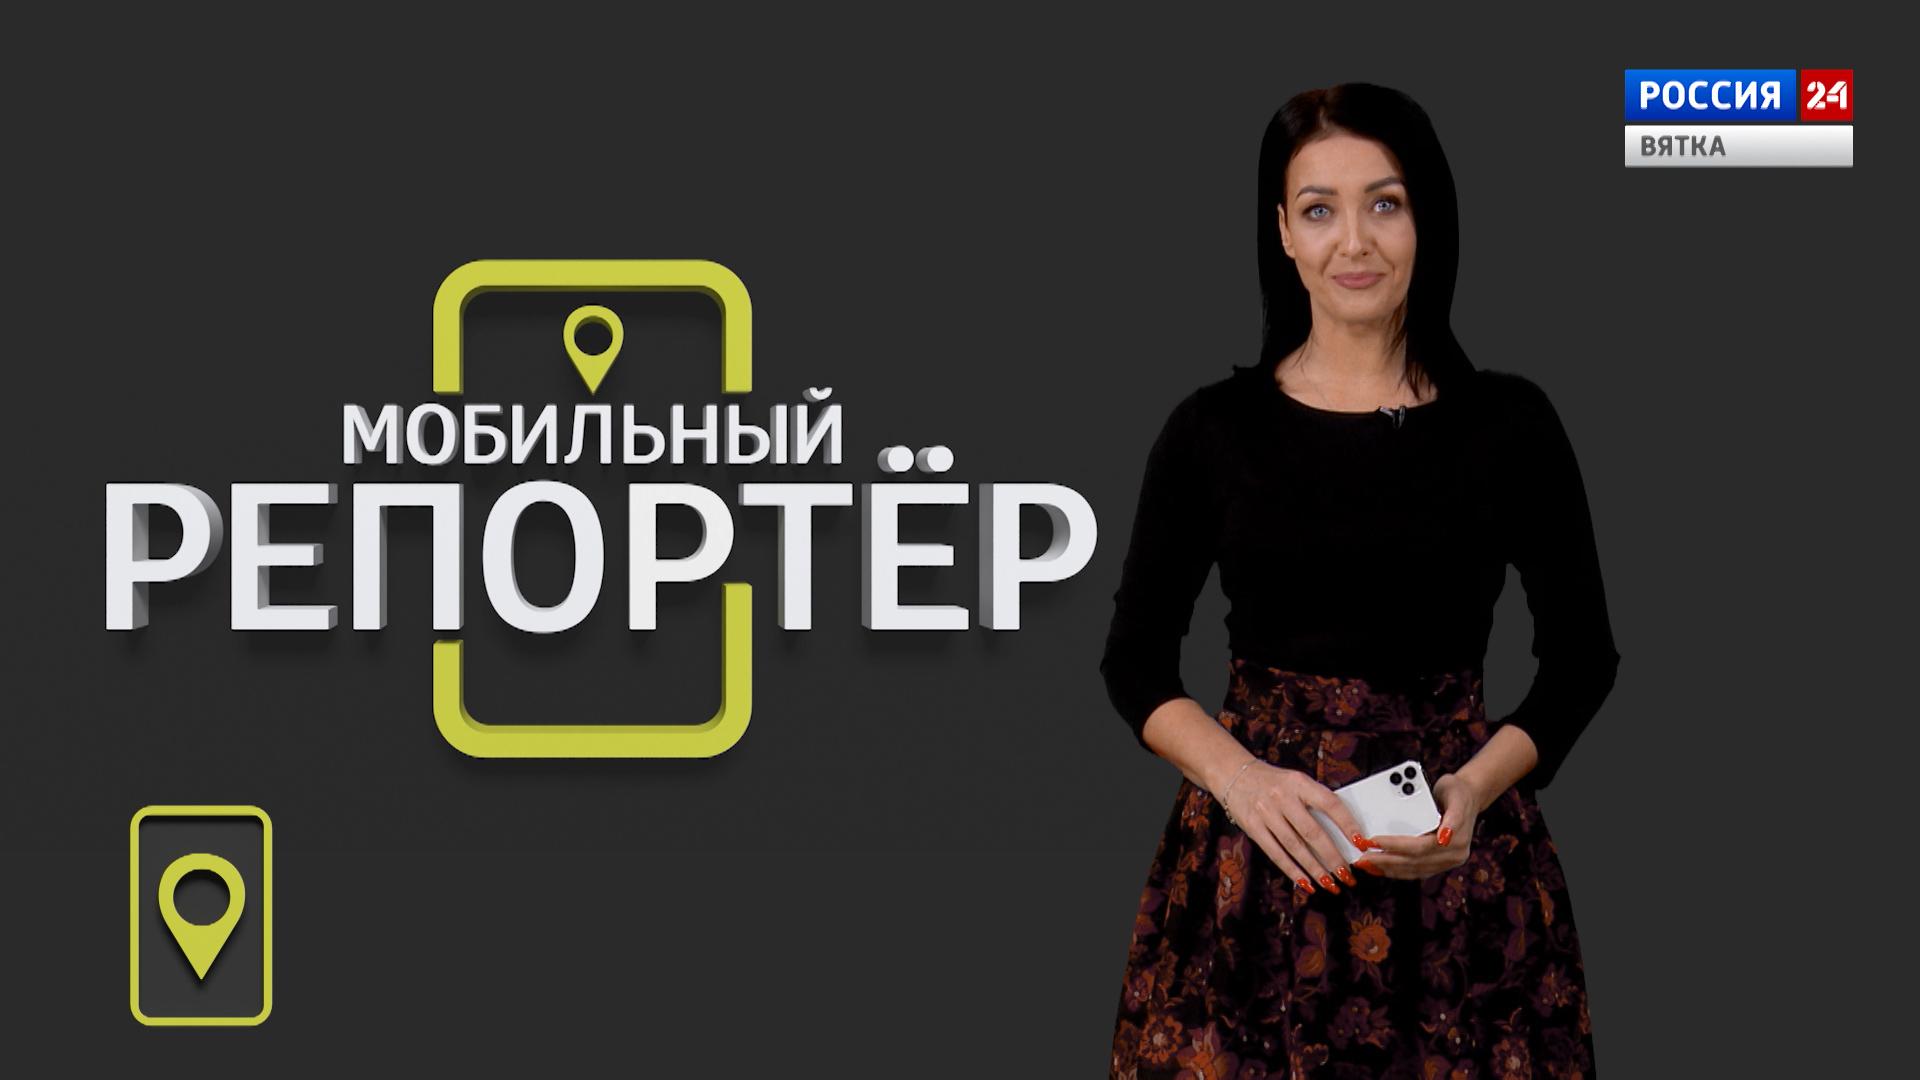 Мобильный репортер (23.04. 2021)